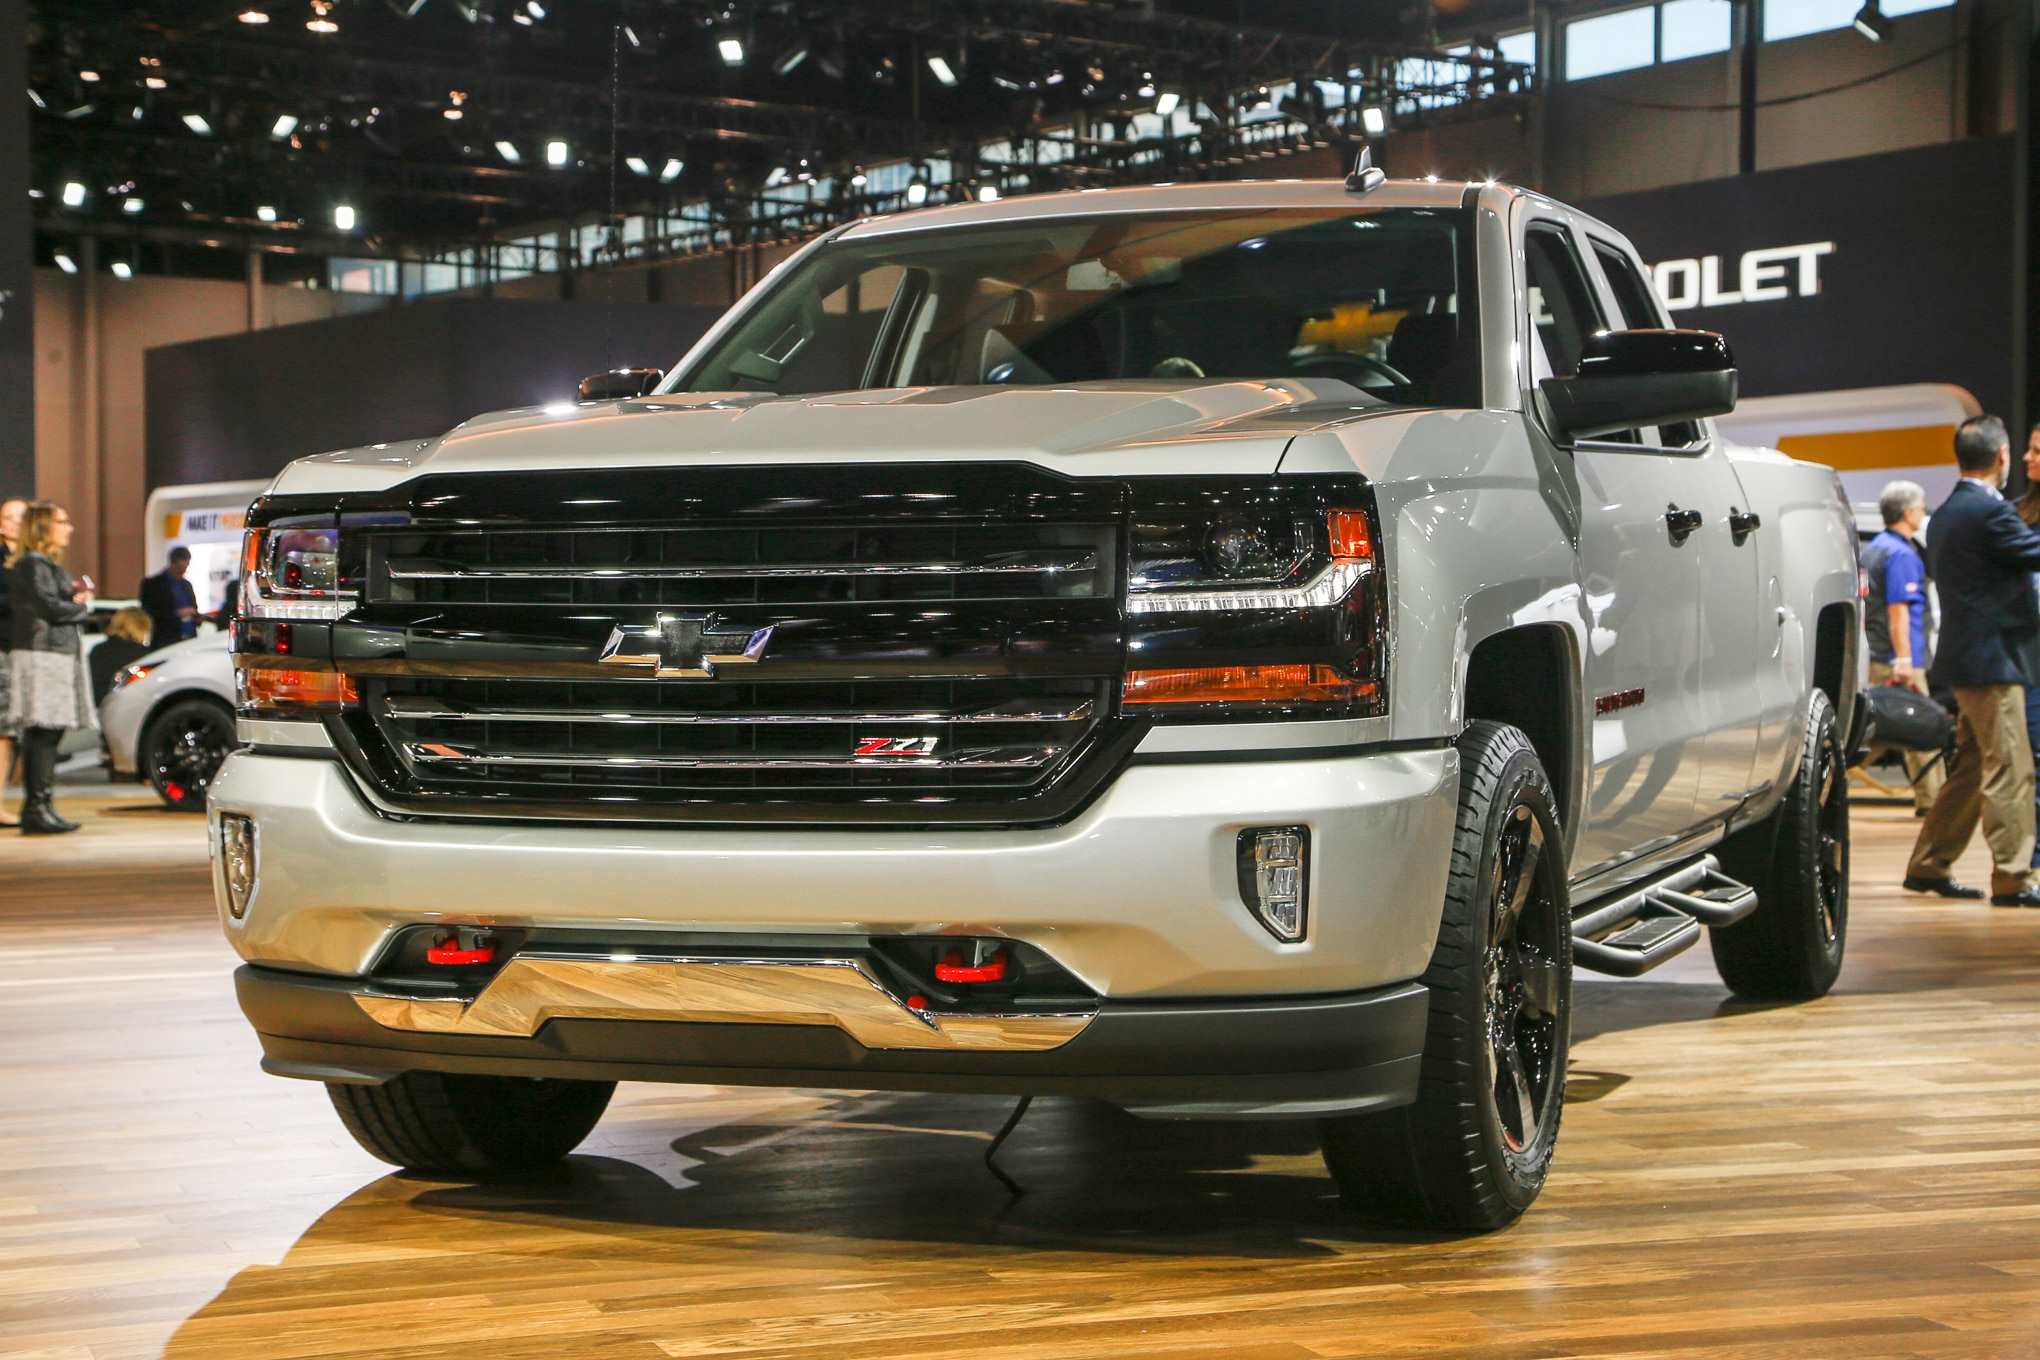 Black Chevy Silverado Bowtie Chevrolet Adds Redline Edition to 13 Vehicles   Automobile Magazine